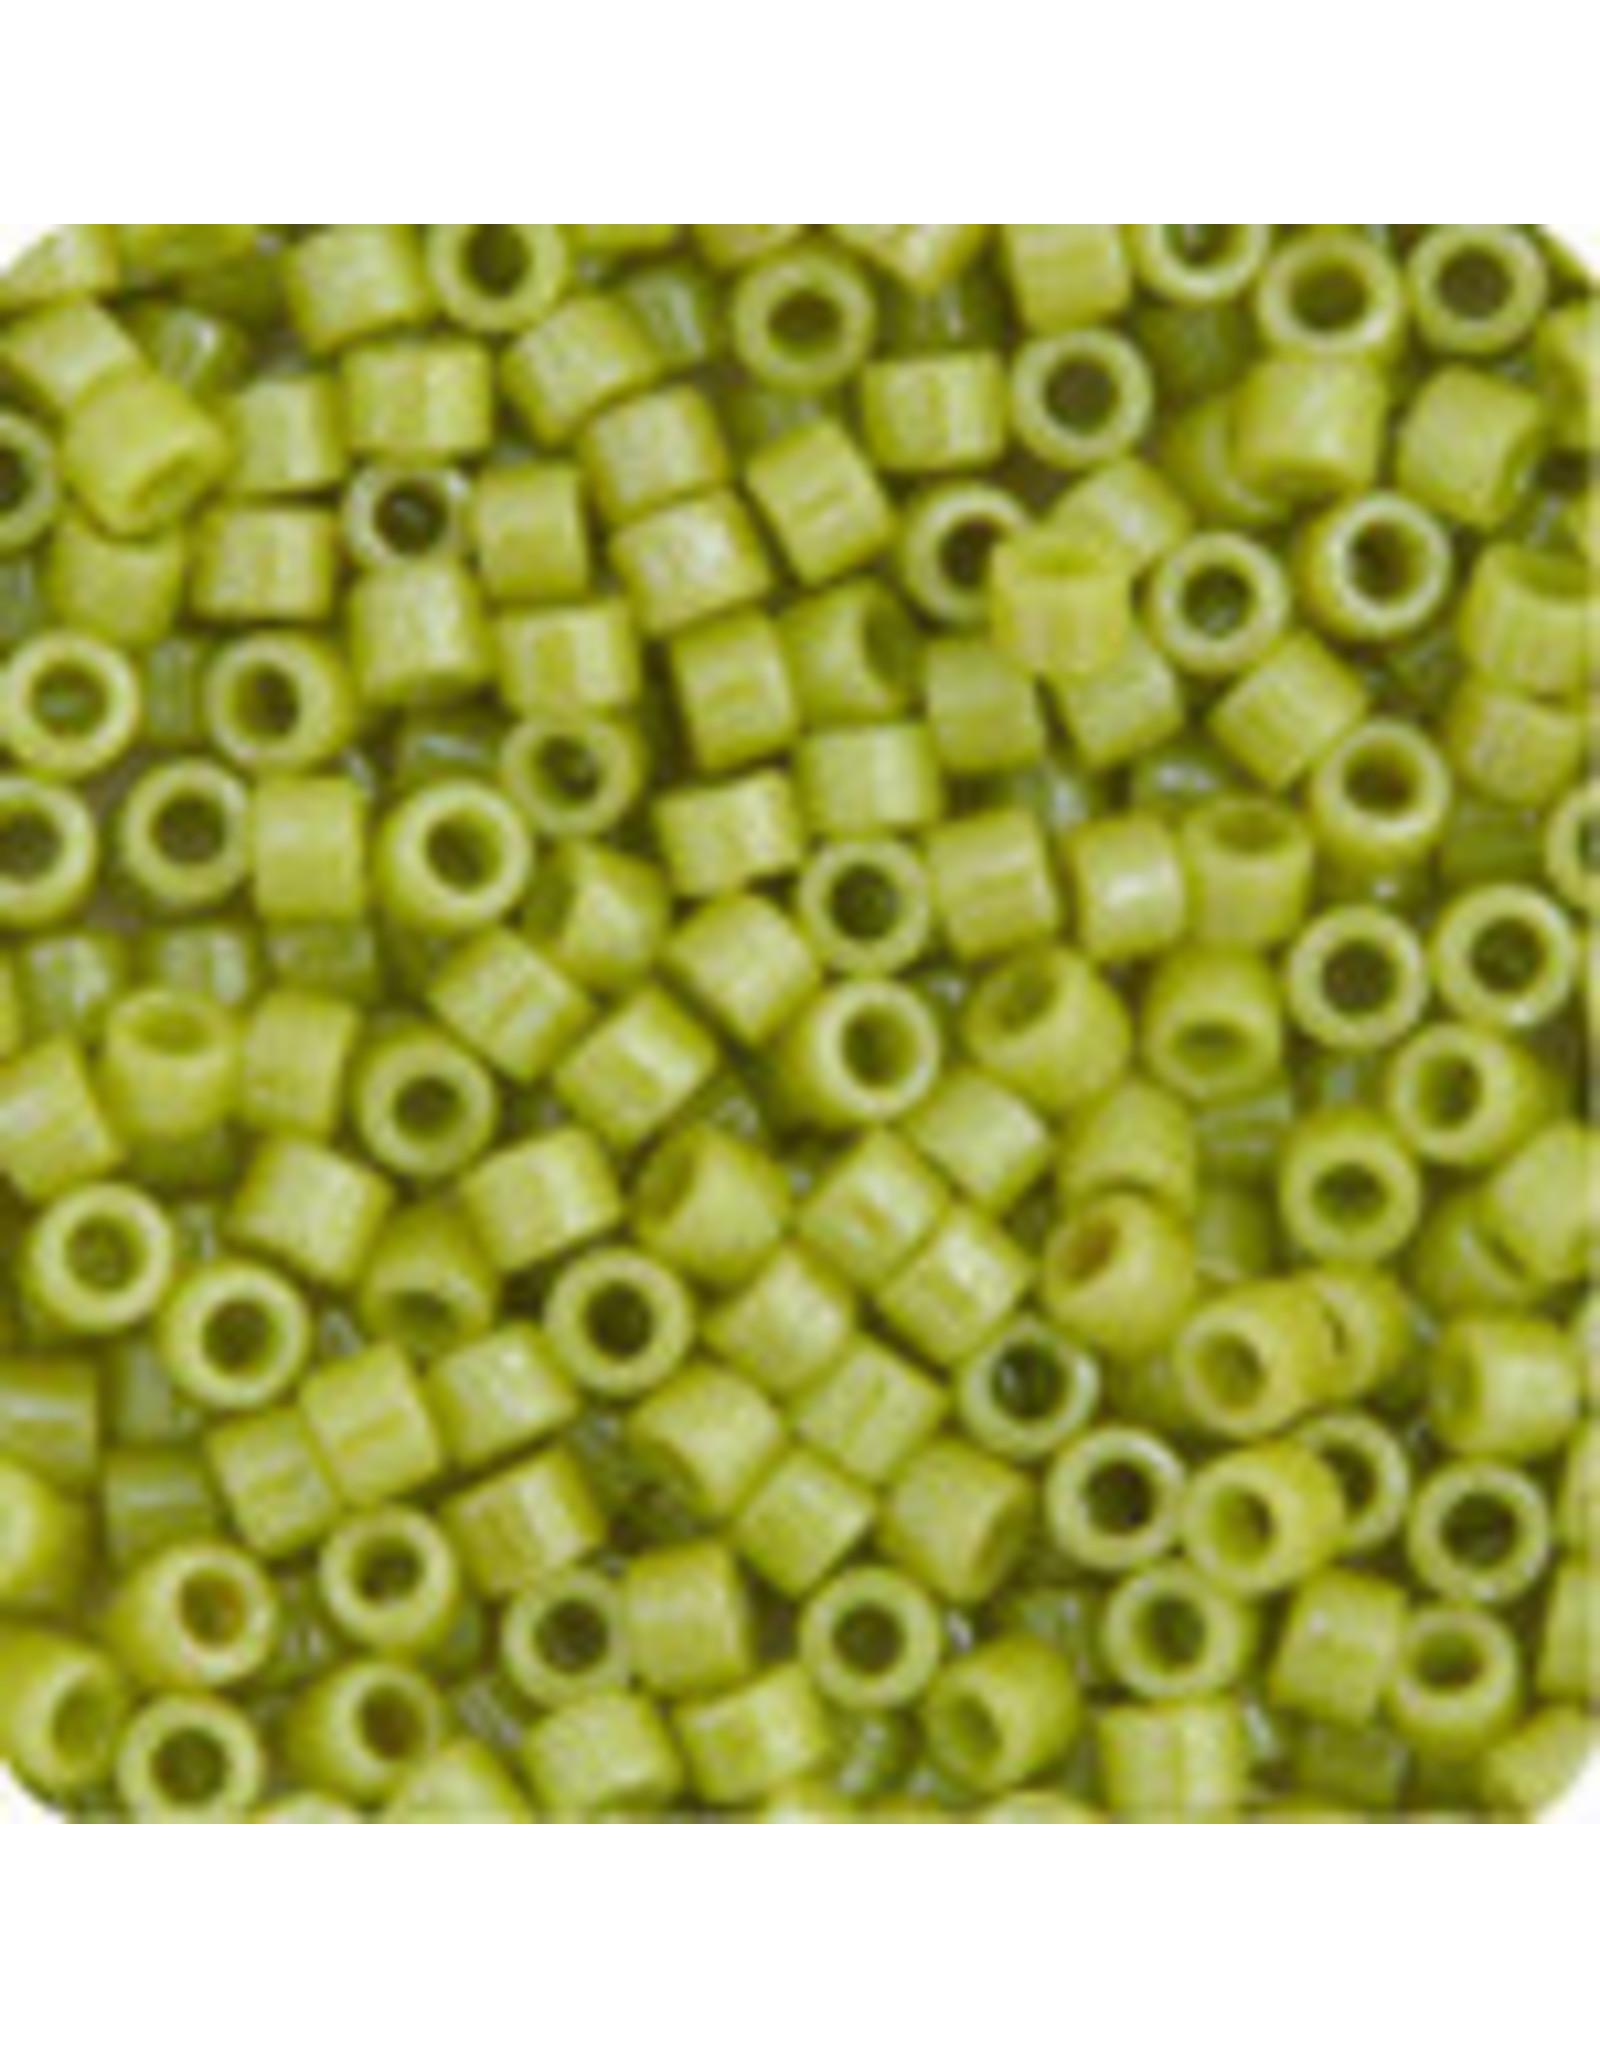 Miyuki db262 11 Delica 3.5g Opaque Chartreuse Green Lustre